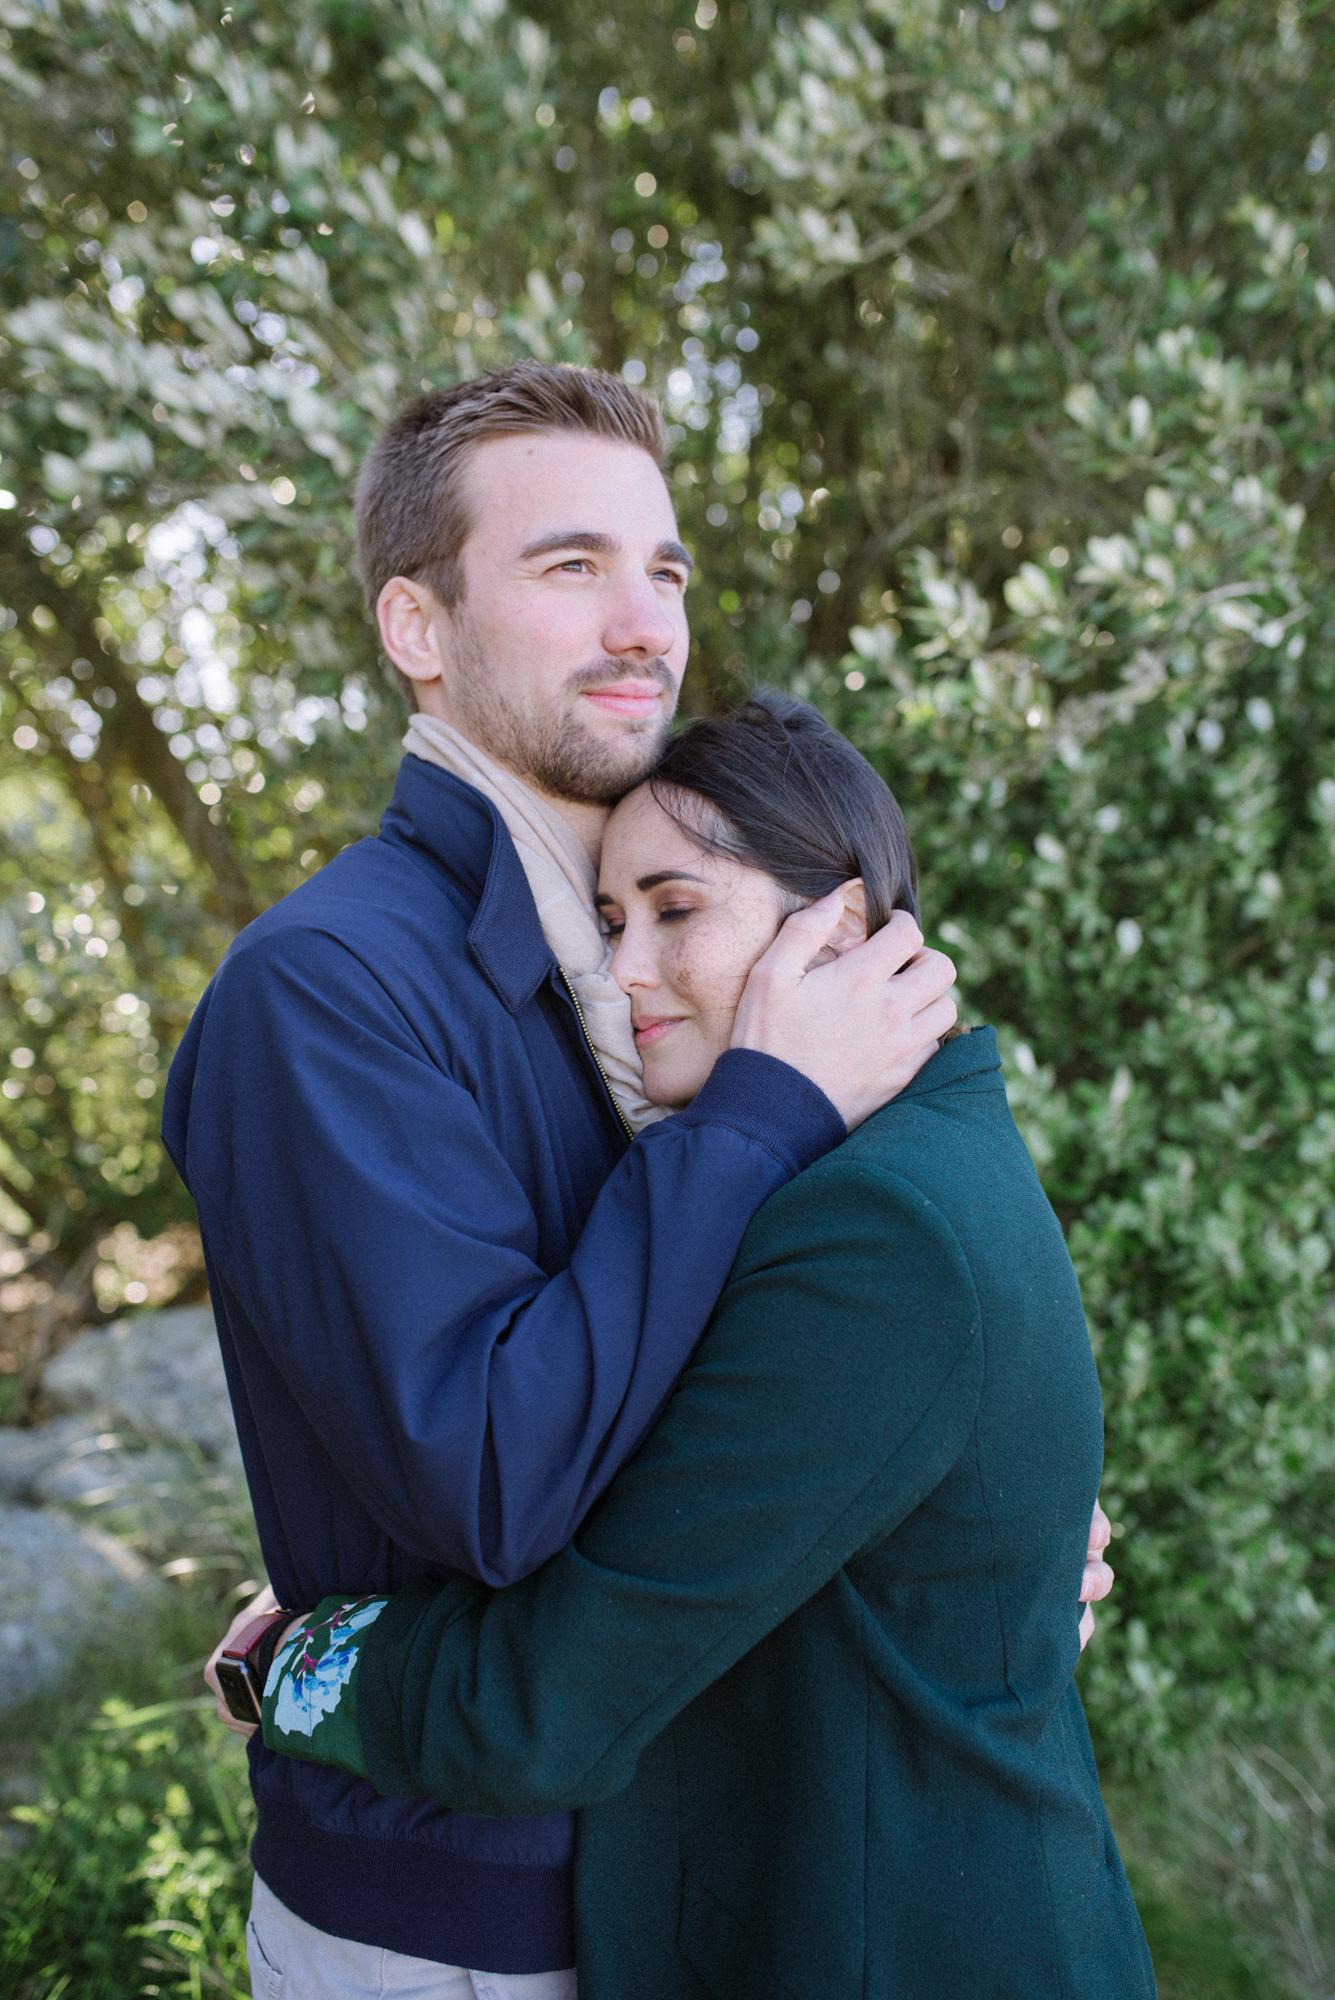 Photographe-mariage-bretagne-finistere-brest-quimper-morlaix-wedding-evenement-famille-couple-professionnel-brignogan